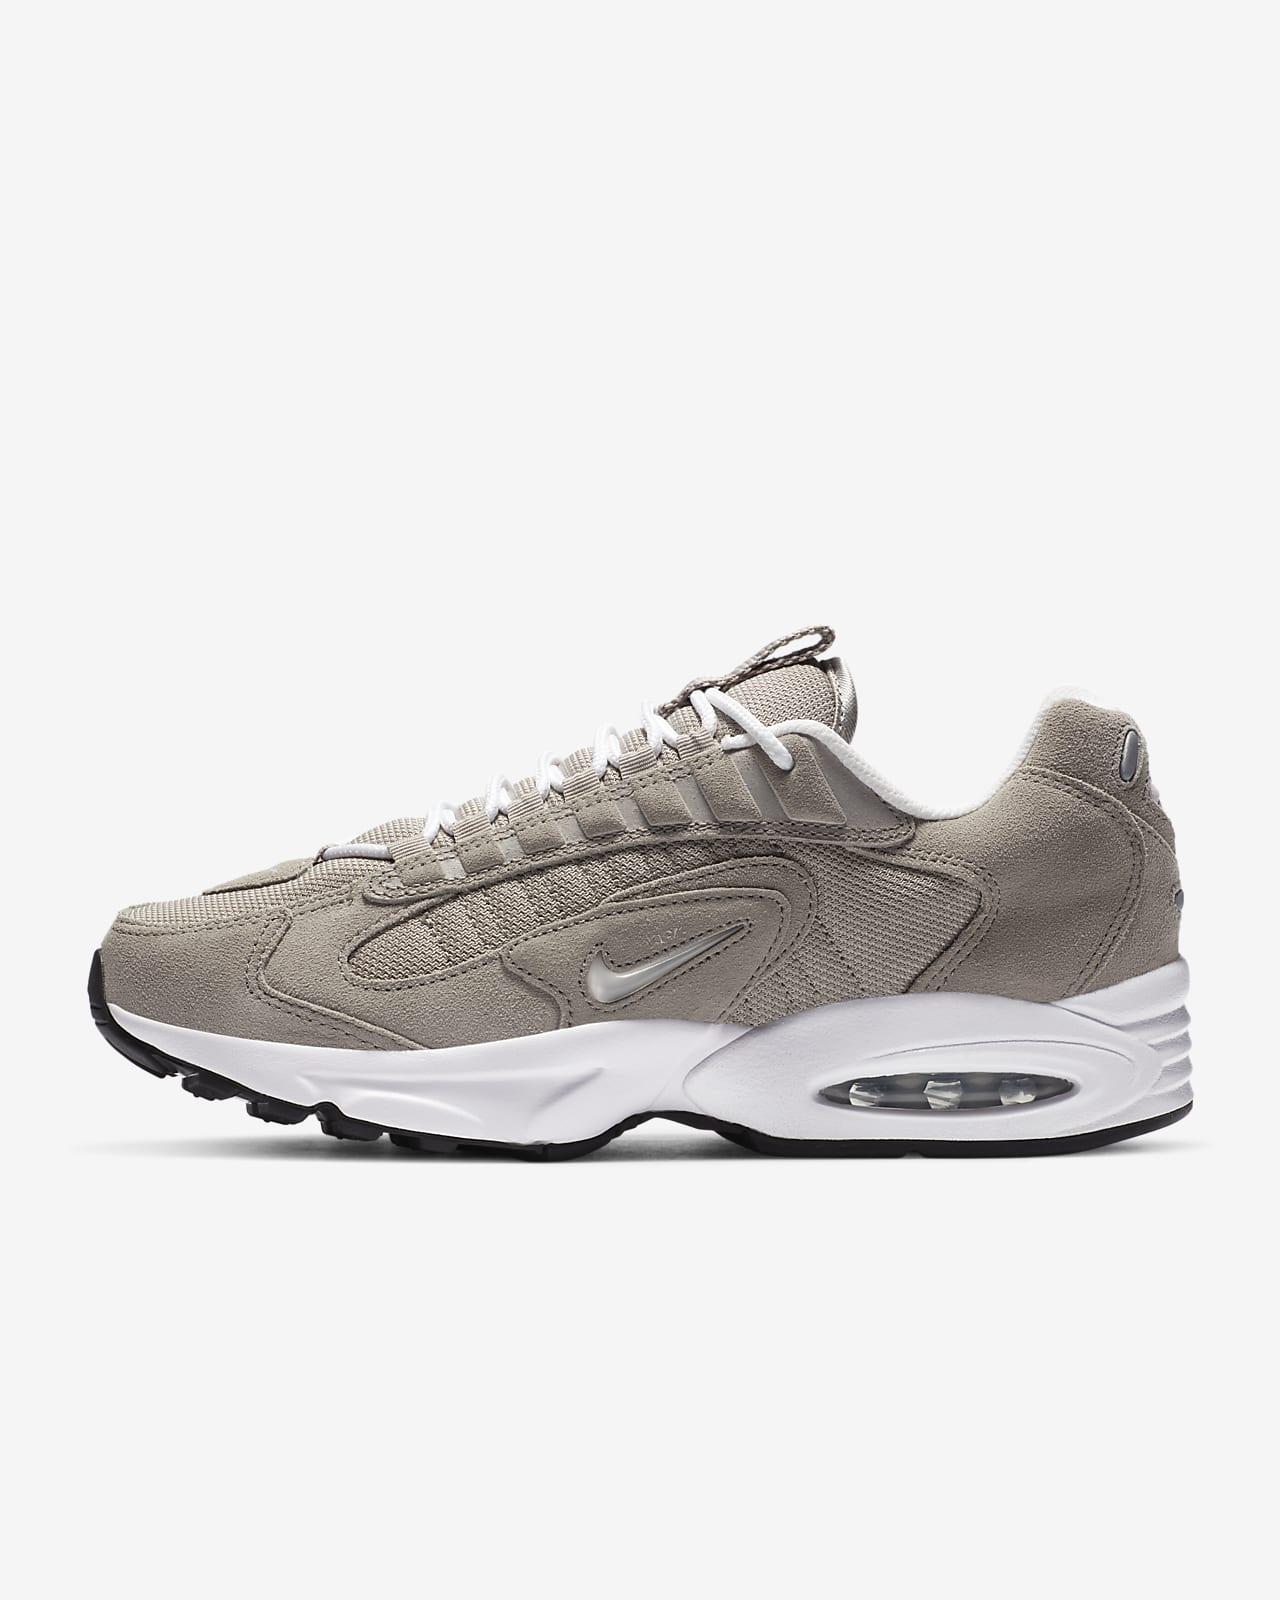 Nike Air Max Triax LE Men's Shoe